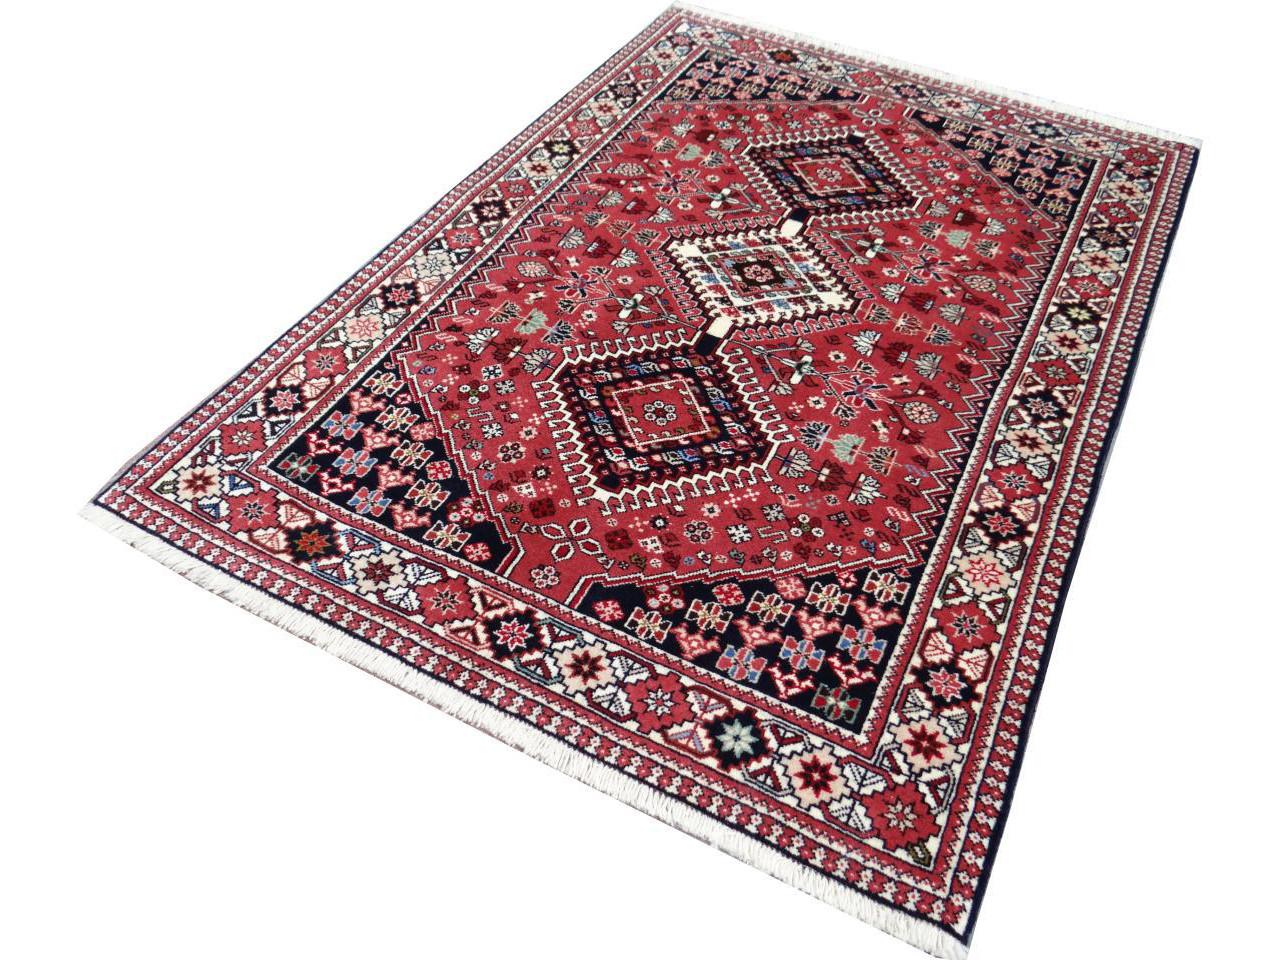 yalameh tapis persans n 2313 148x102cm. Black Bedroom Furniture Sets. Home Design Ideas